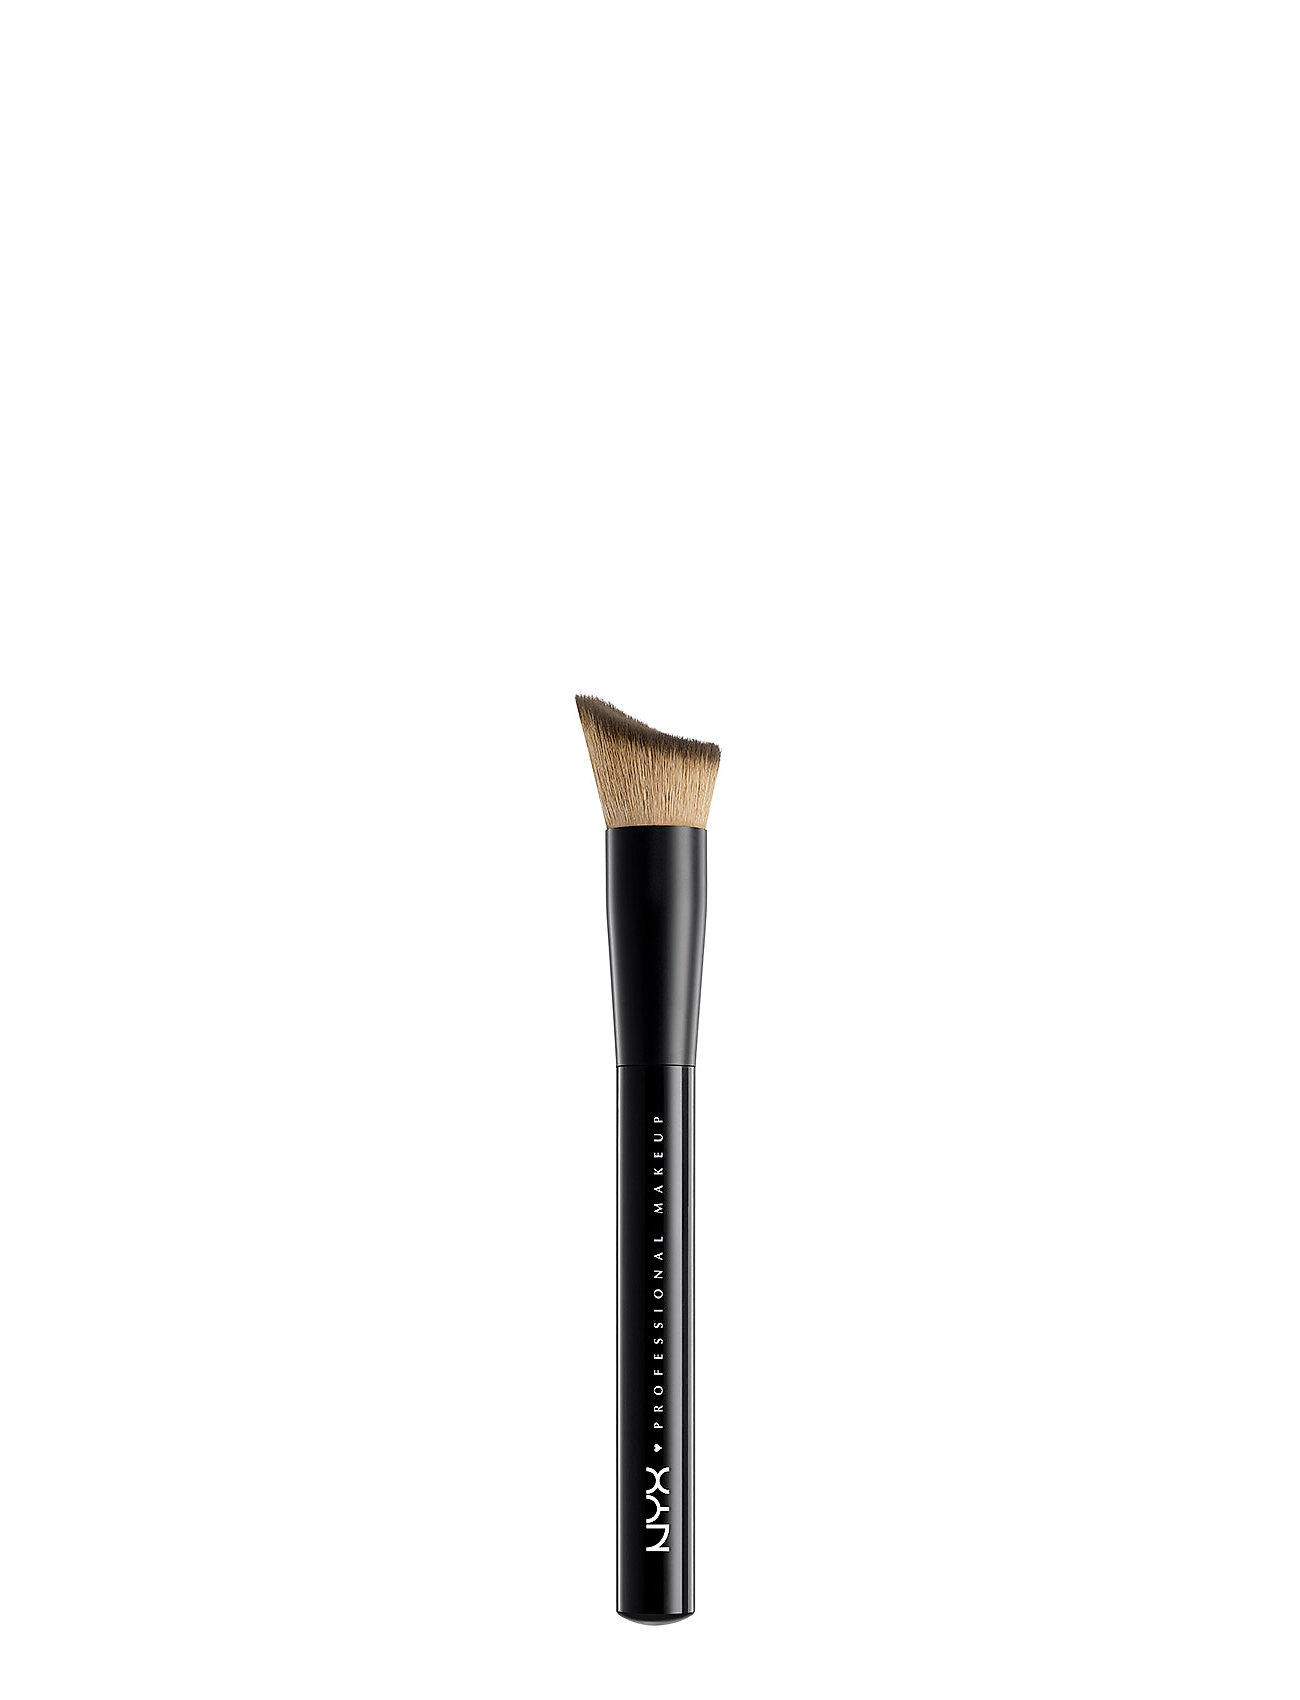 Image of Custom Drop Foundation Brush Beauty WOMEN Makeup Makeup Brushes Face Brushes Nude NYX PROFESSIONAL MAKEUP (3158631515)